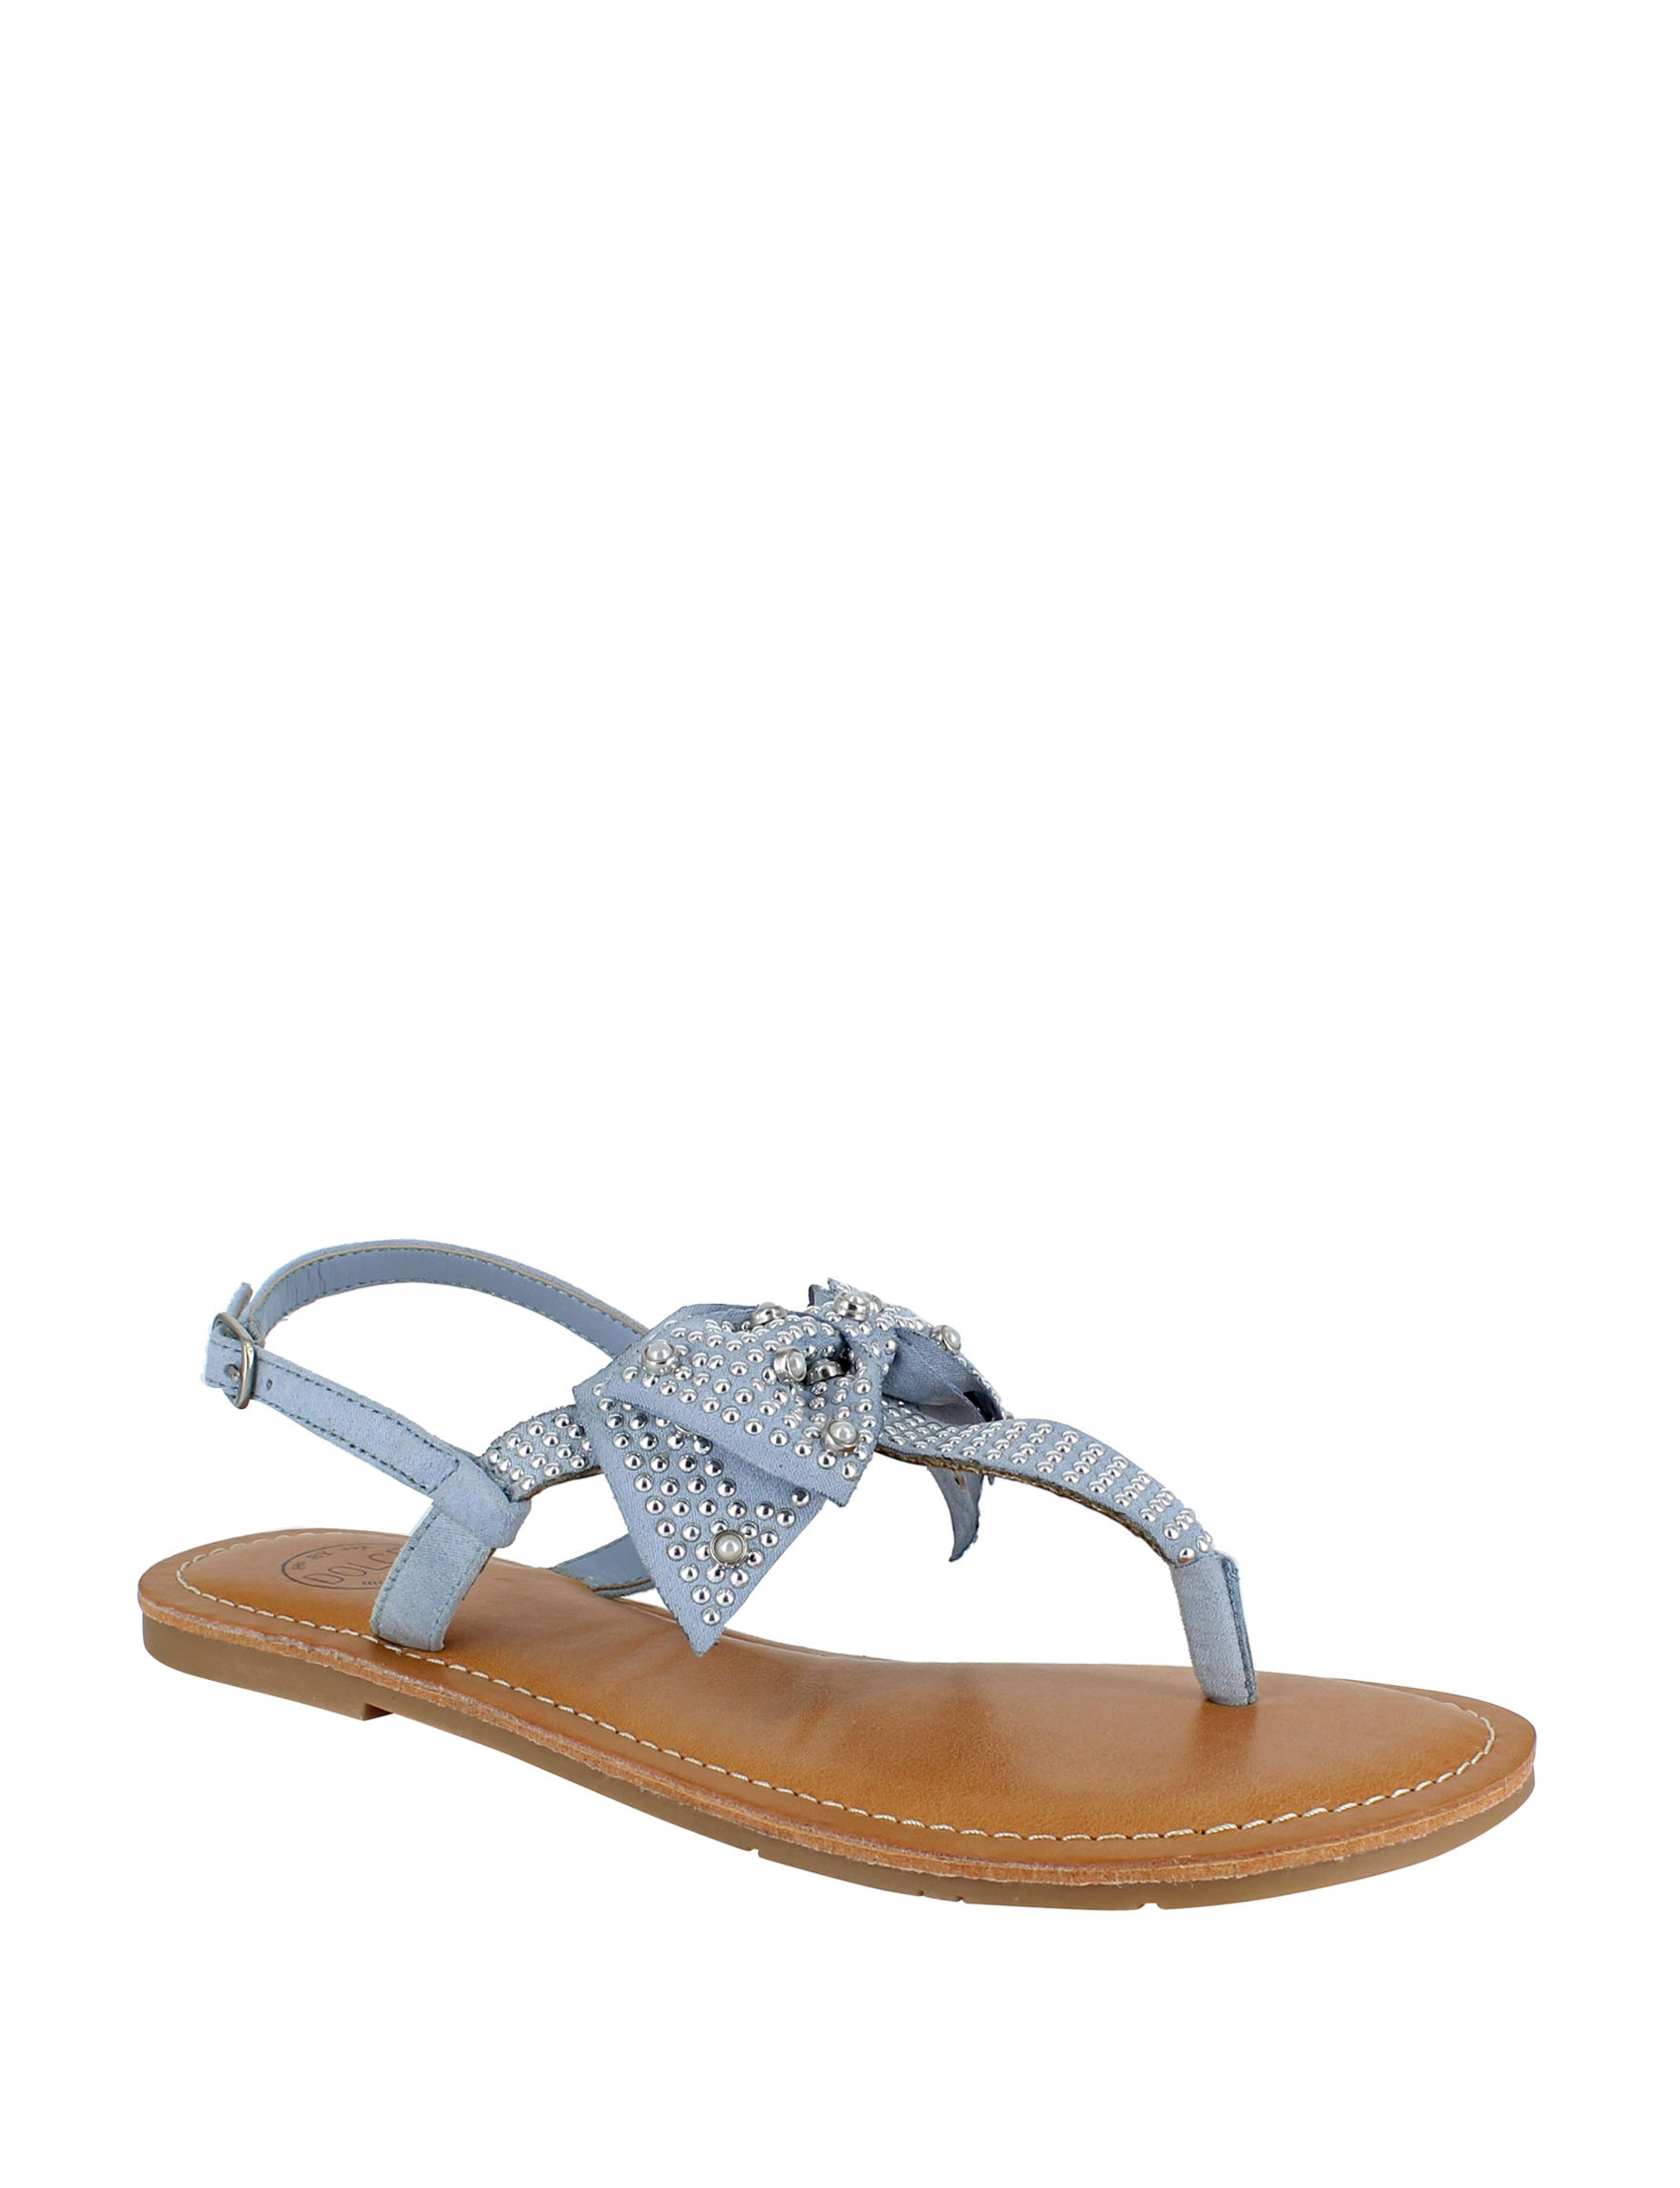 Dolce by Mojo Moxy Light Blue Flat Sandals